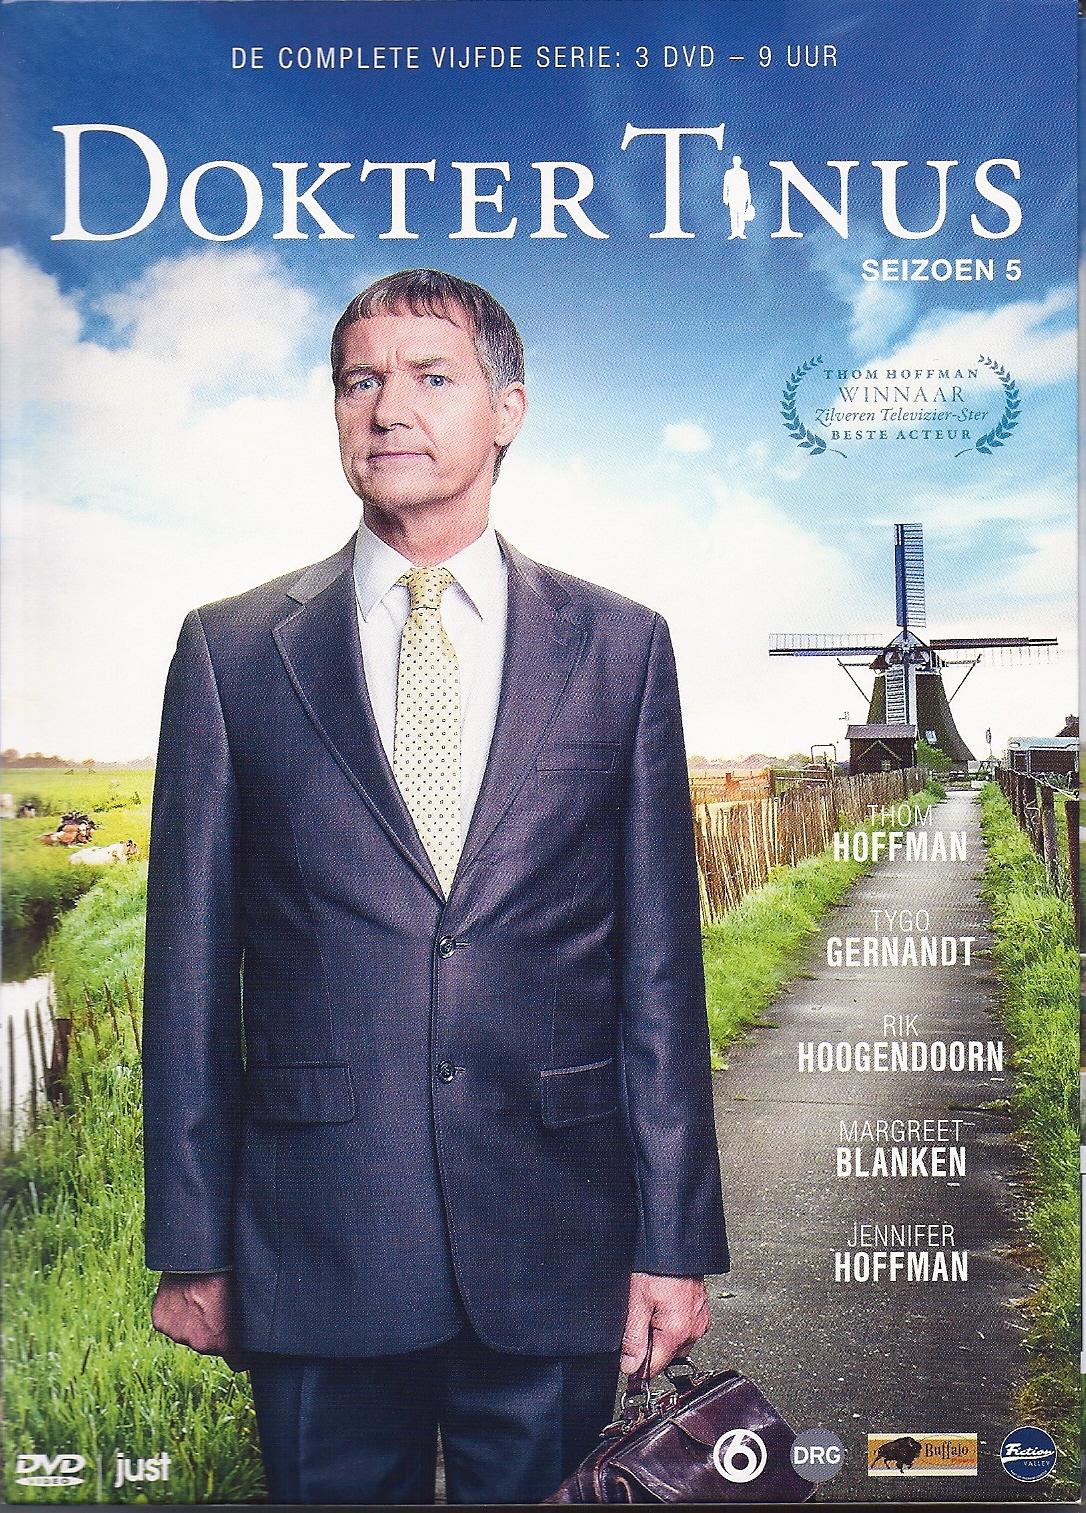 DVD-016 Dokter Tinus seizoen 5